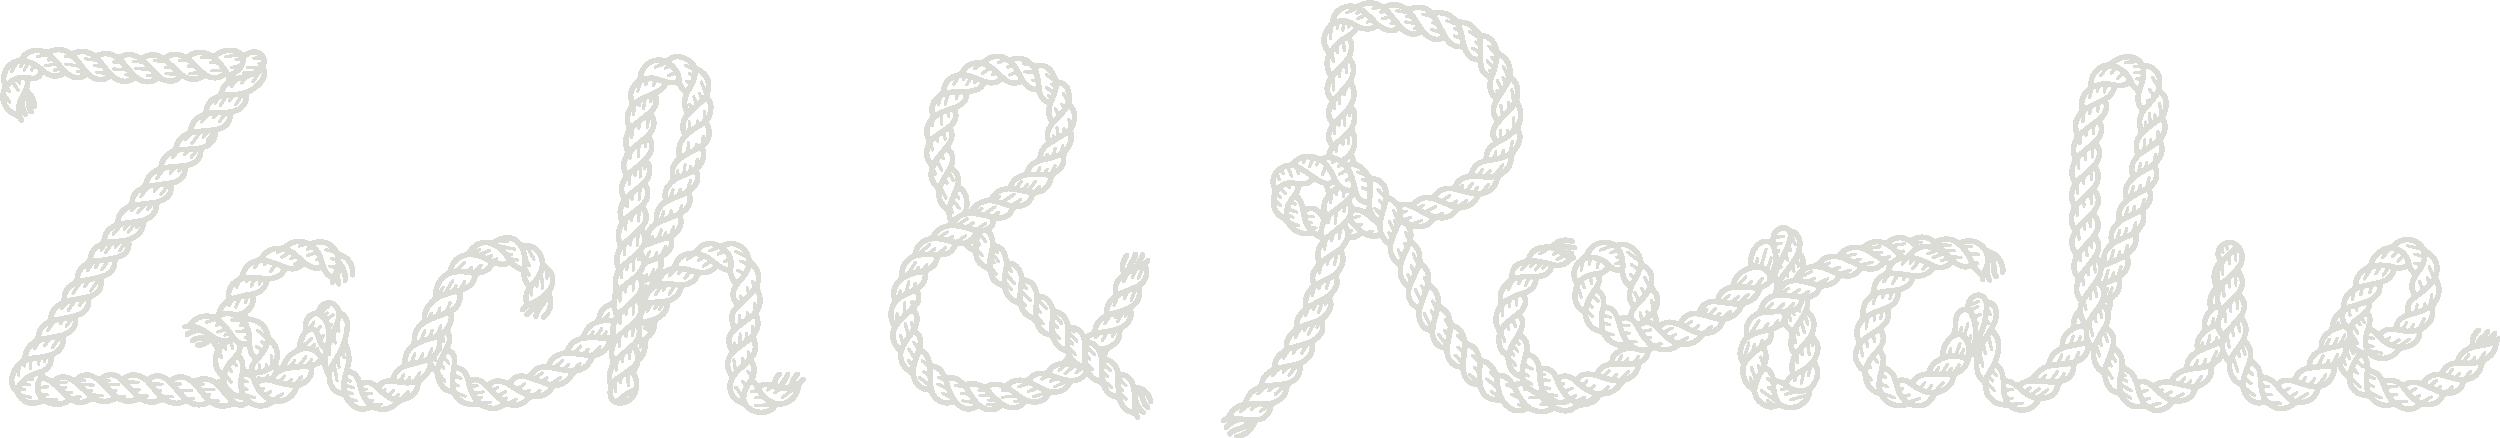 Z&R-HEADER grey.png